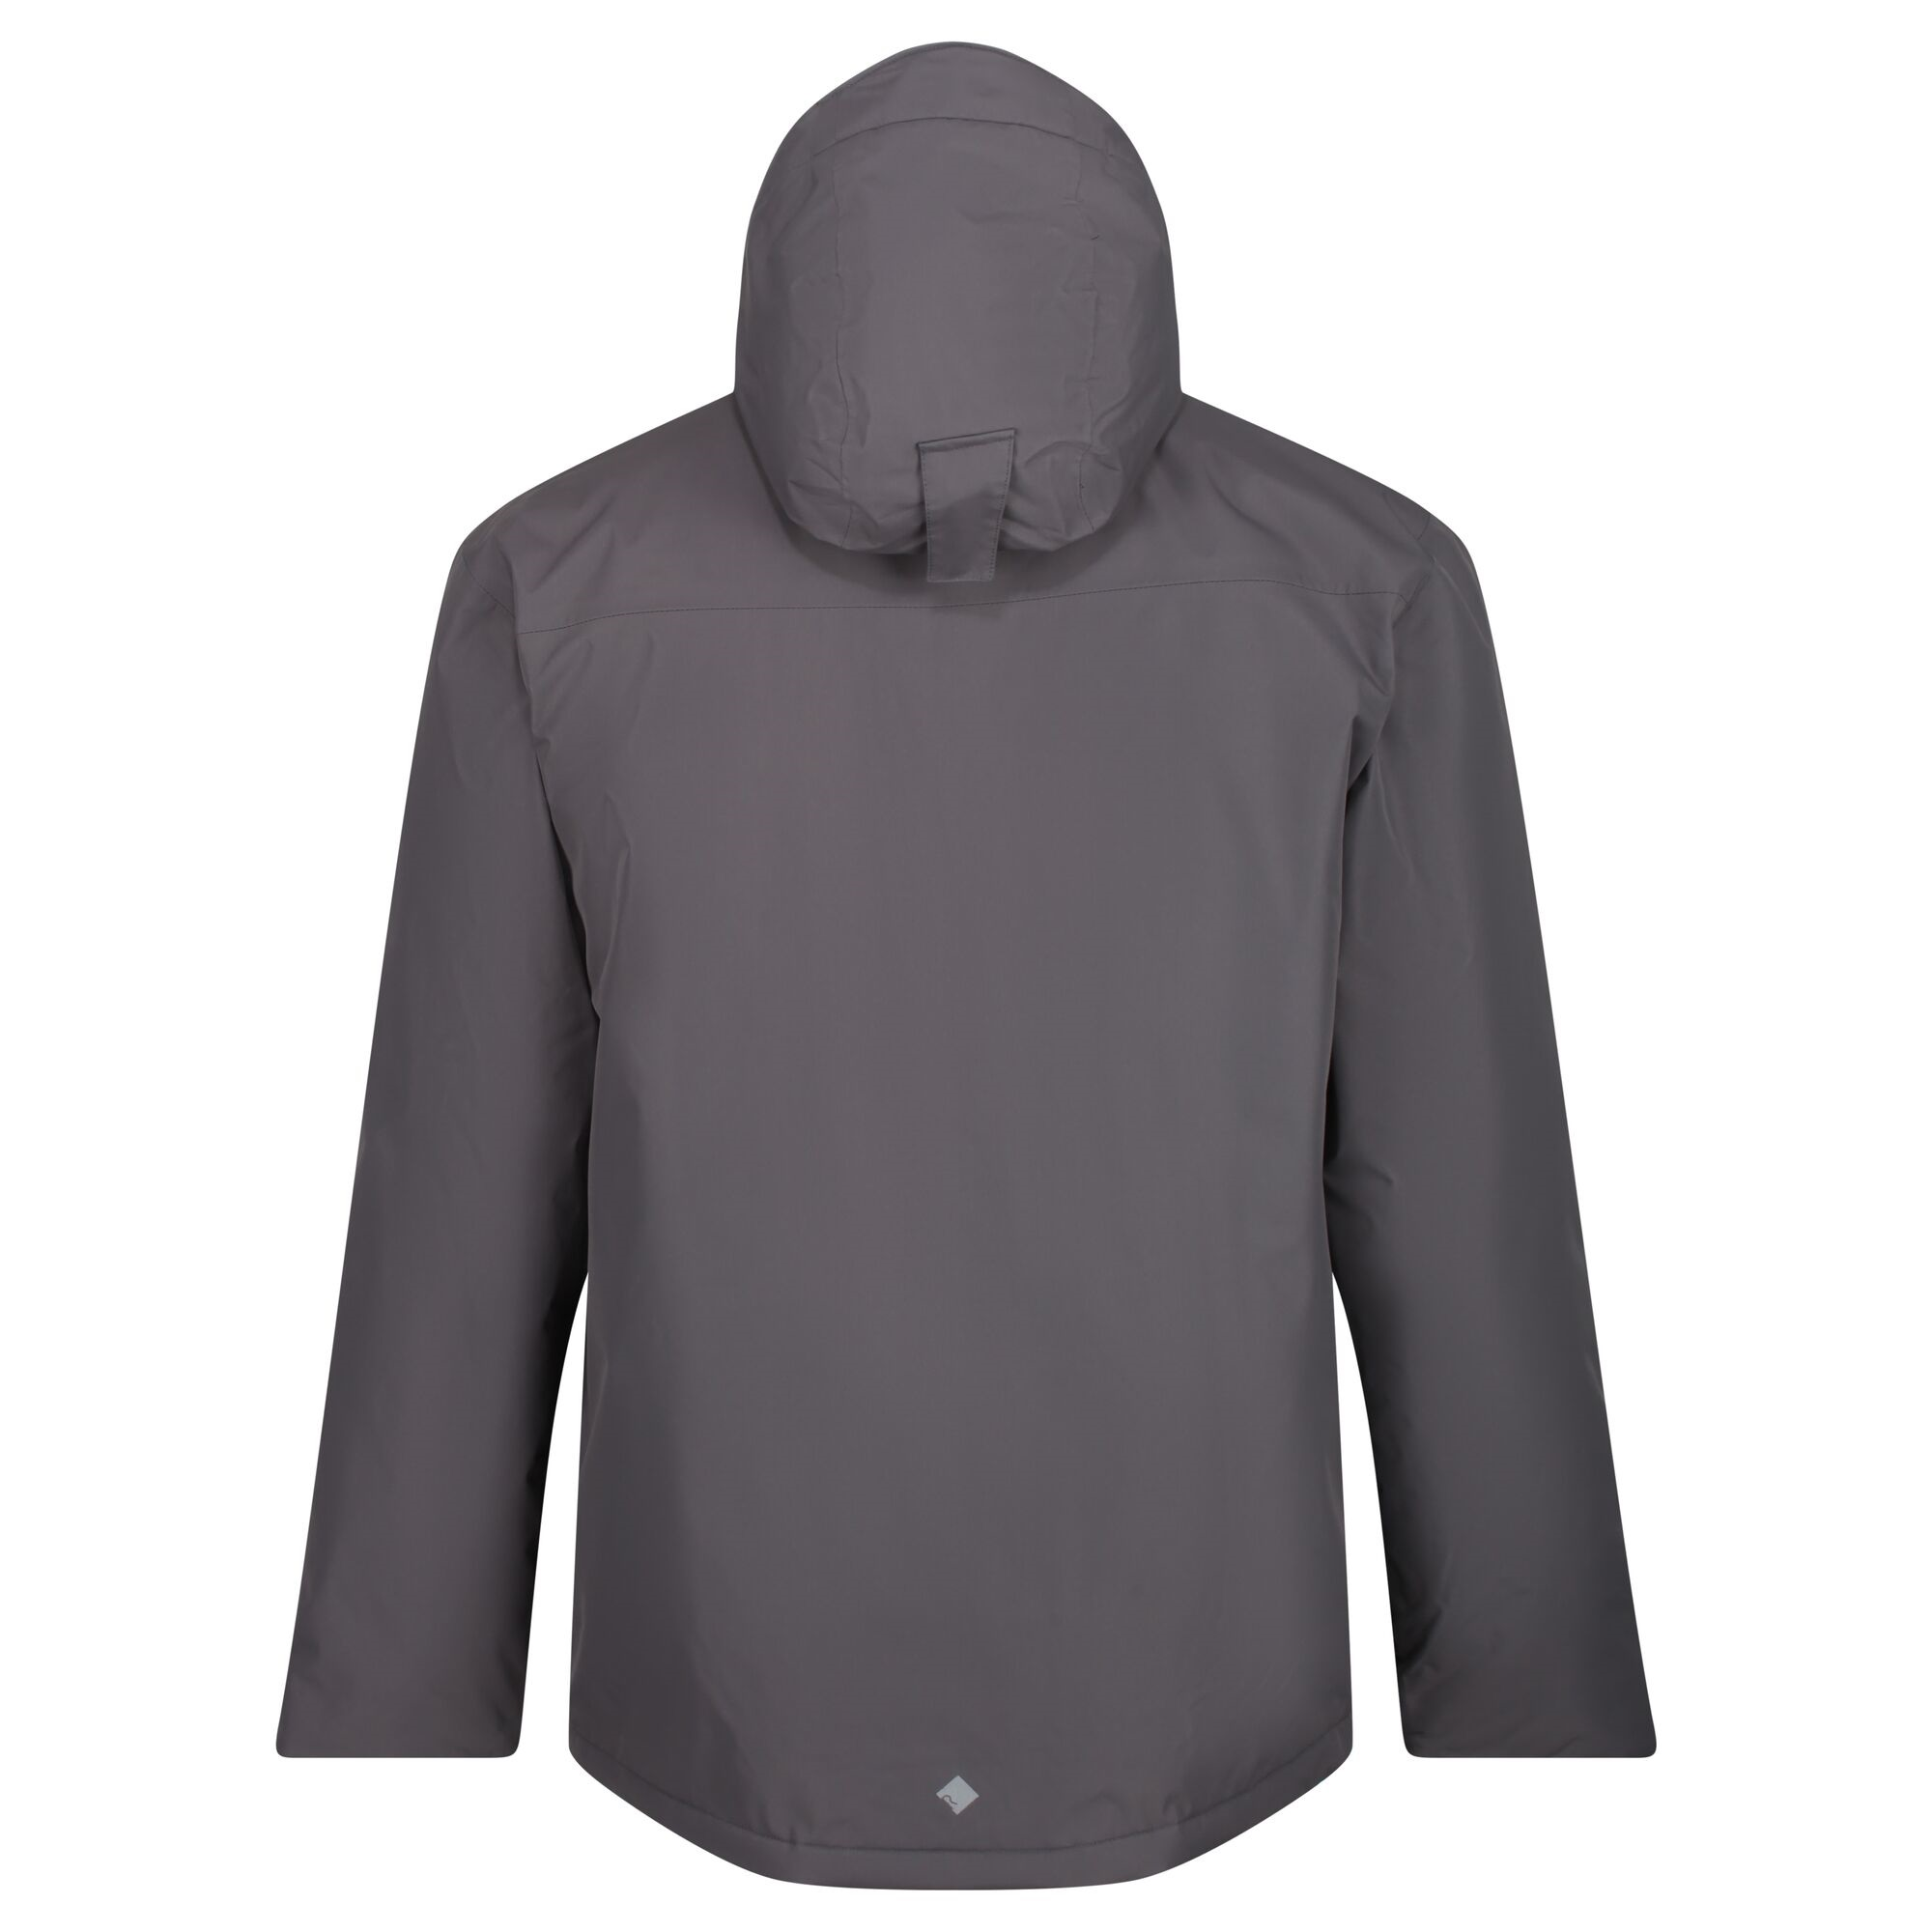 Regatta-Mens-Thornridge-II-Insulated-Jacket-RG4468 thumbnail 10